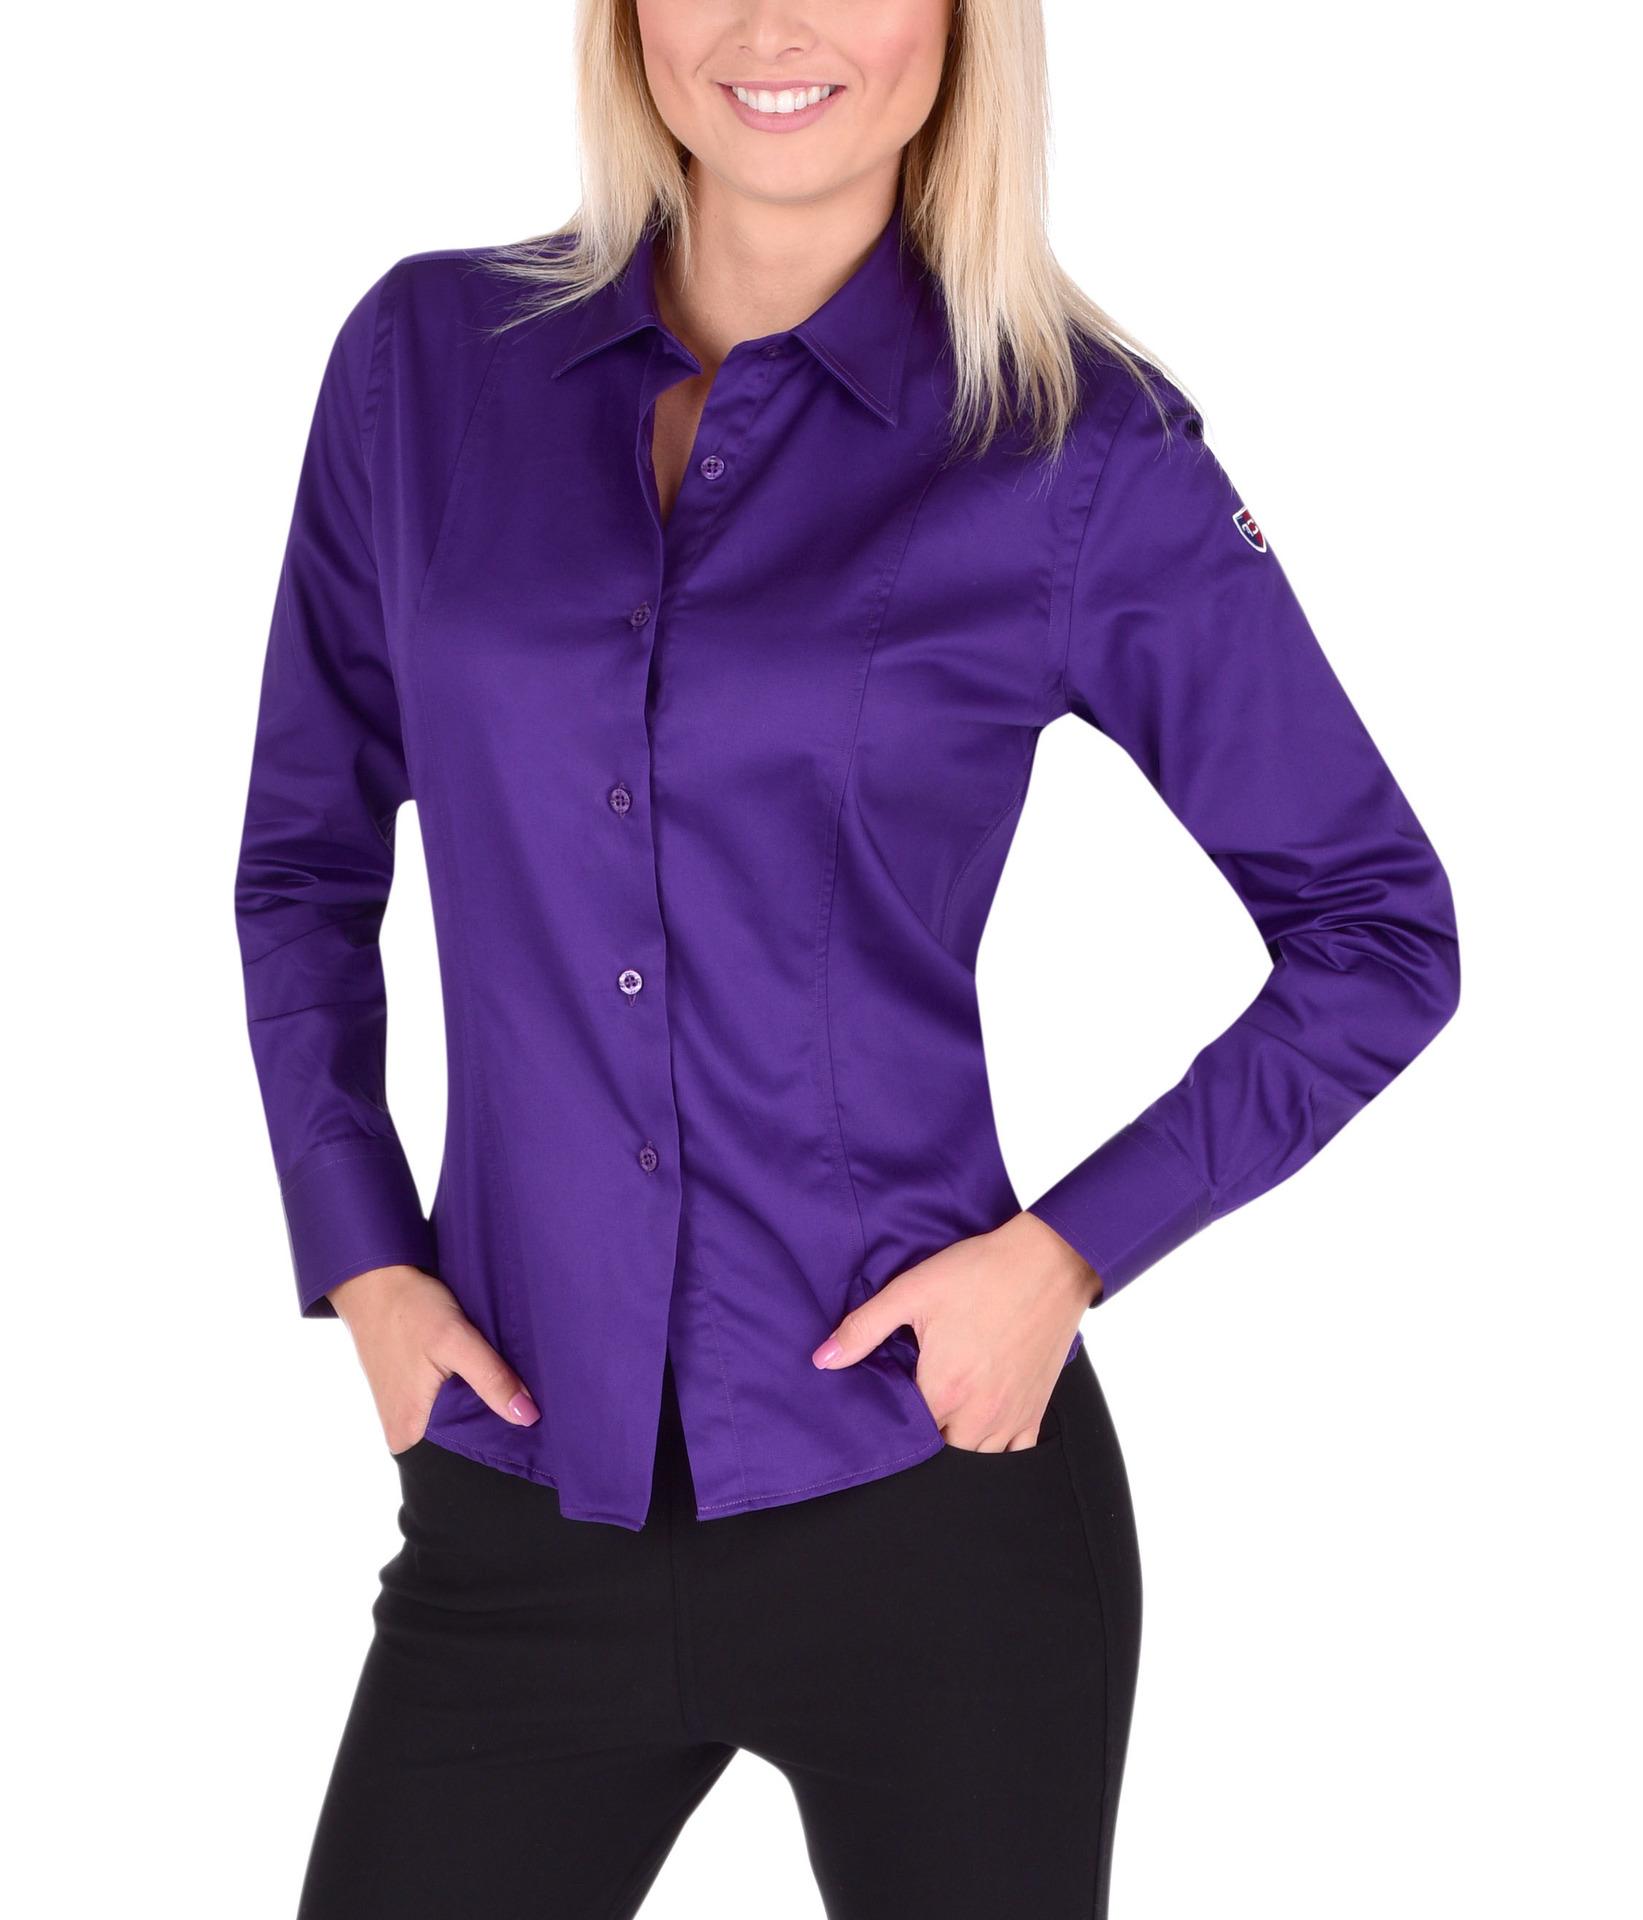 SOPHIA košile  slim fit s dlouhým rukávem dark violet L